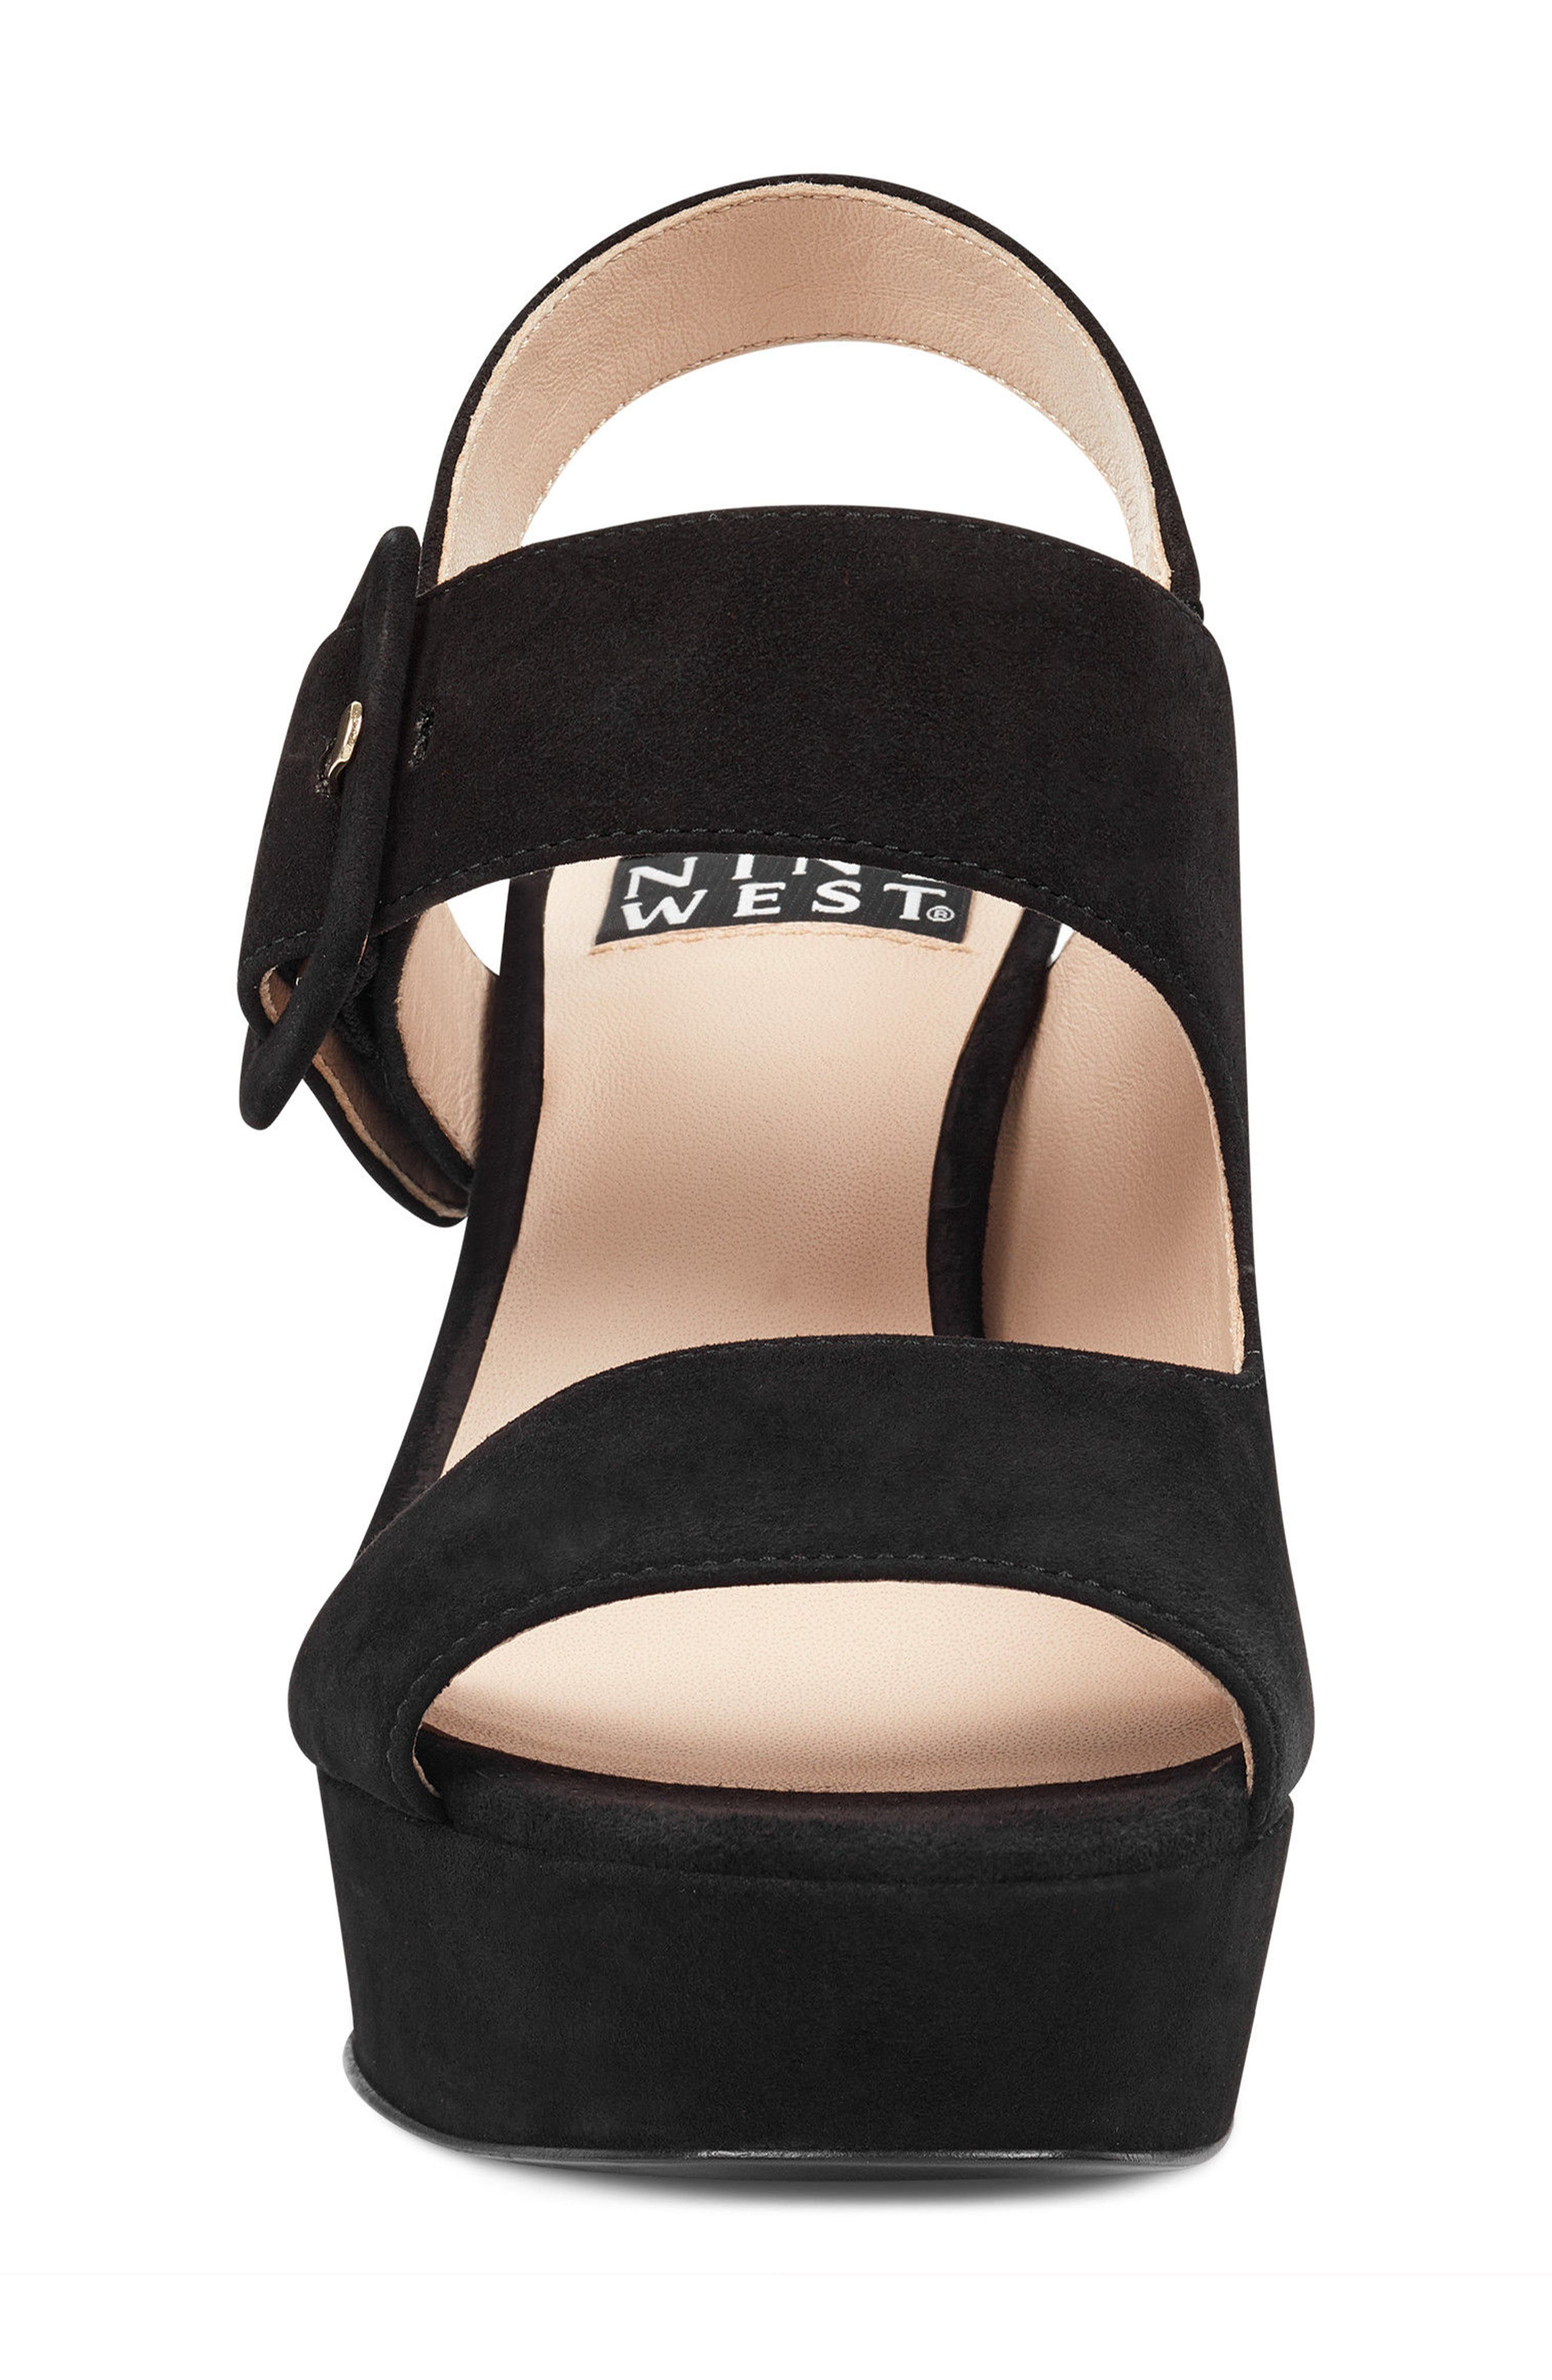 Lexine - 40th Anniversary Capsule Collection Platform Sandal,                             Alternate thumbnail 4, color,                             BLACK LEATHER